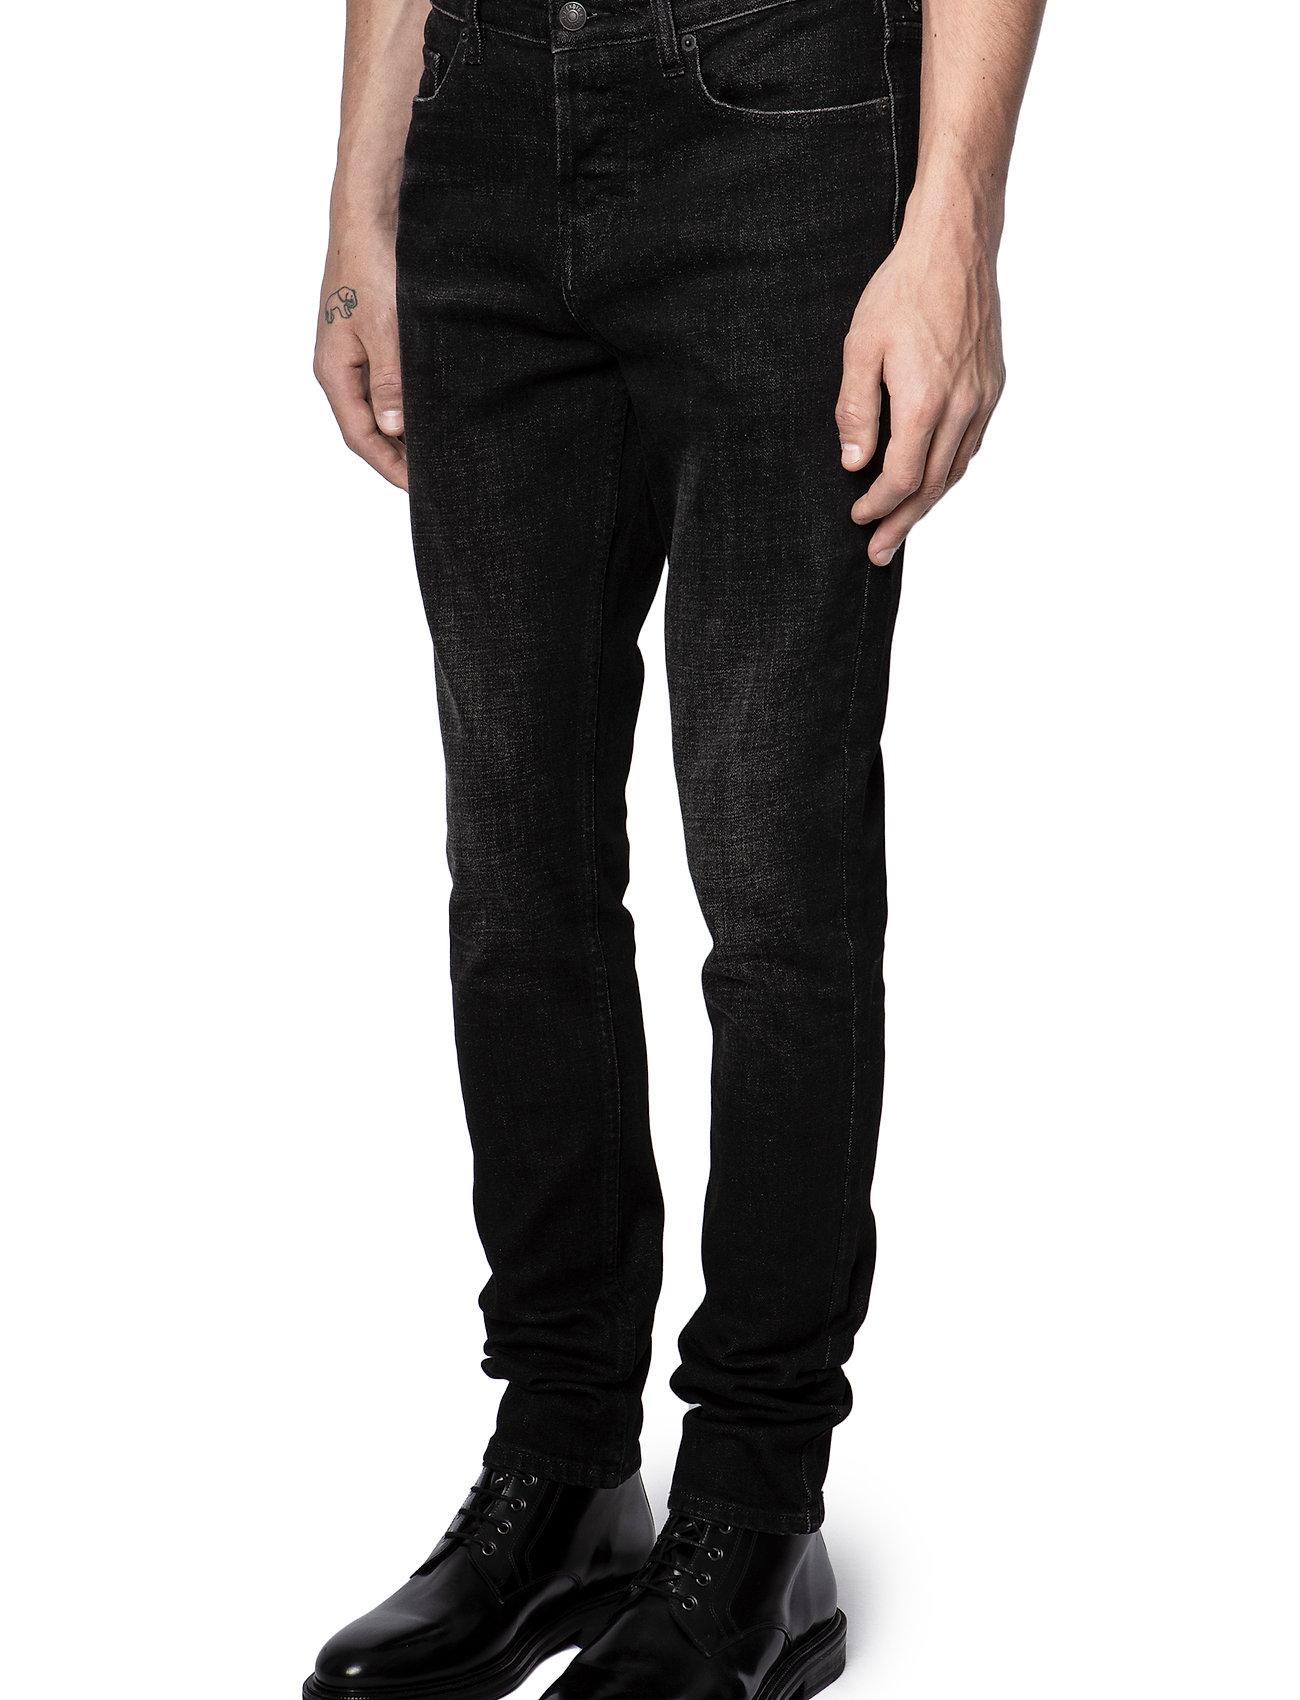 Zadig & Voltaire - DAVID ECO ANTHRA JEANS - slim jeans - grey - 7